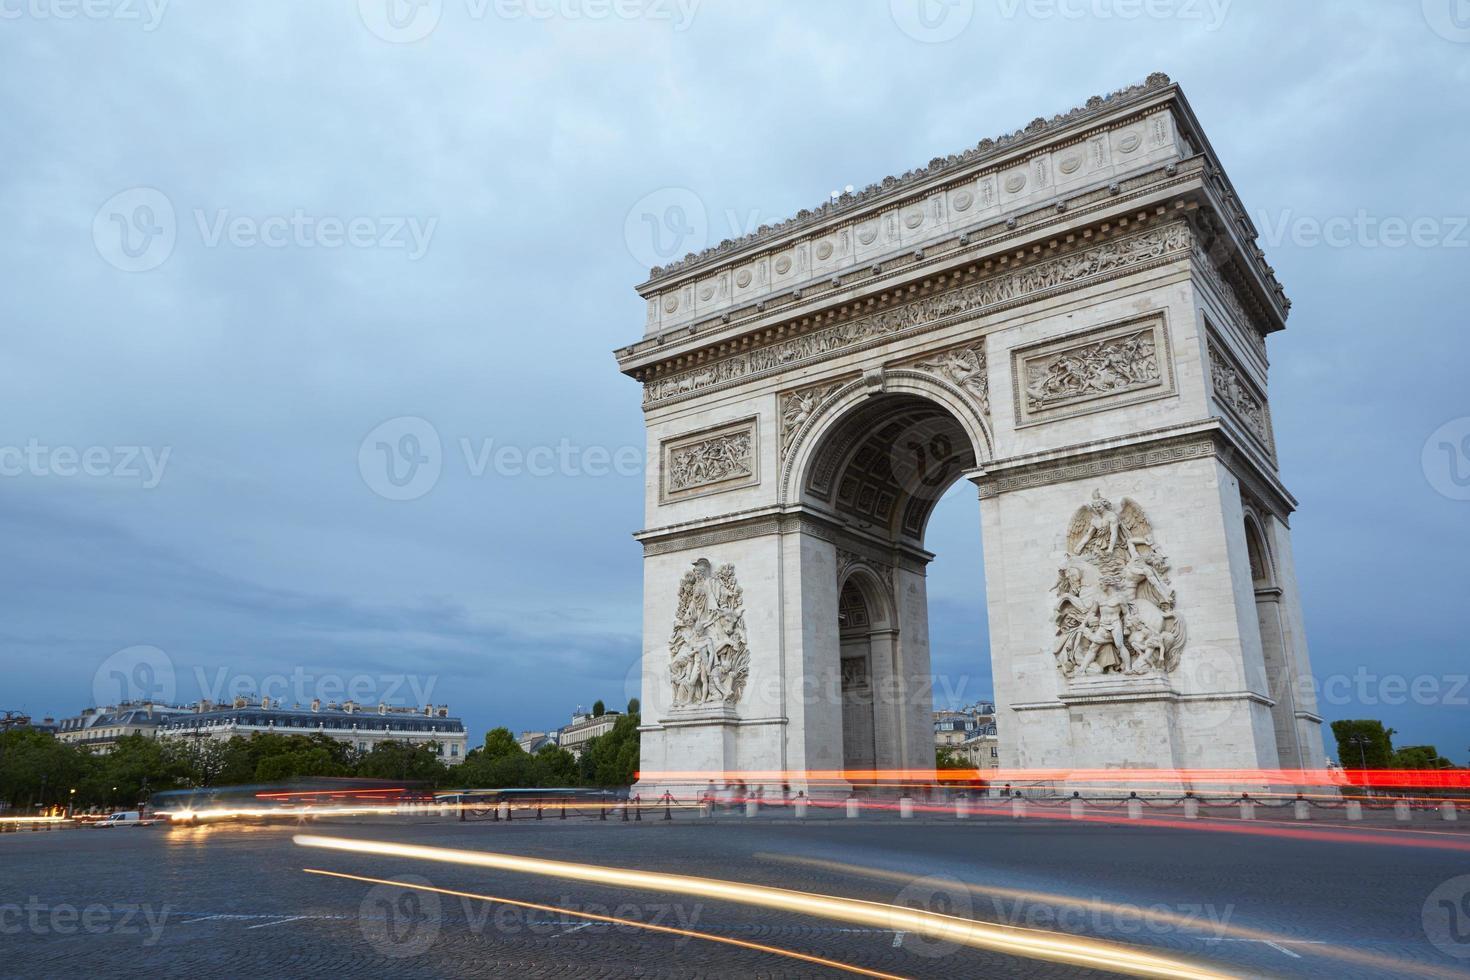 L'arco di trionfo a Parigi la sera foto